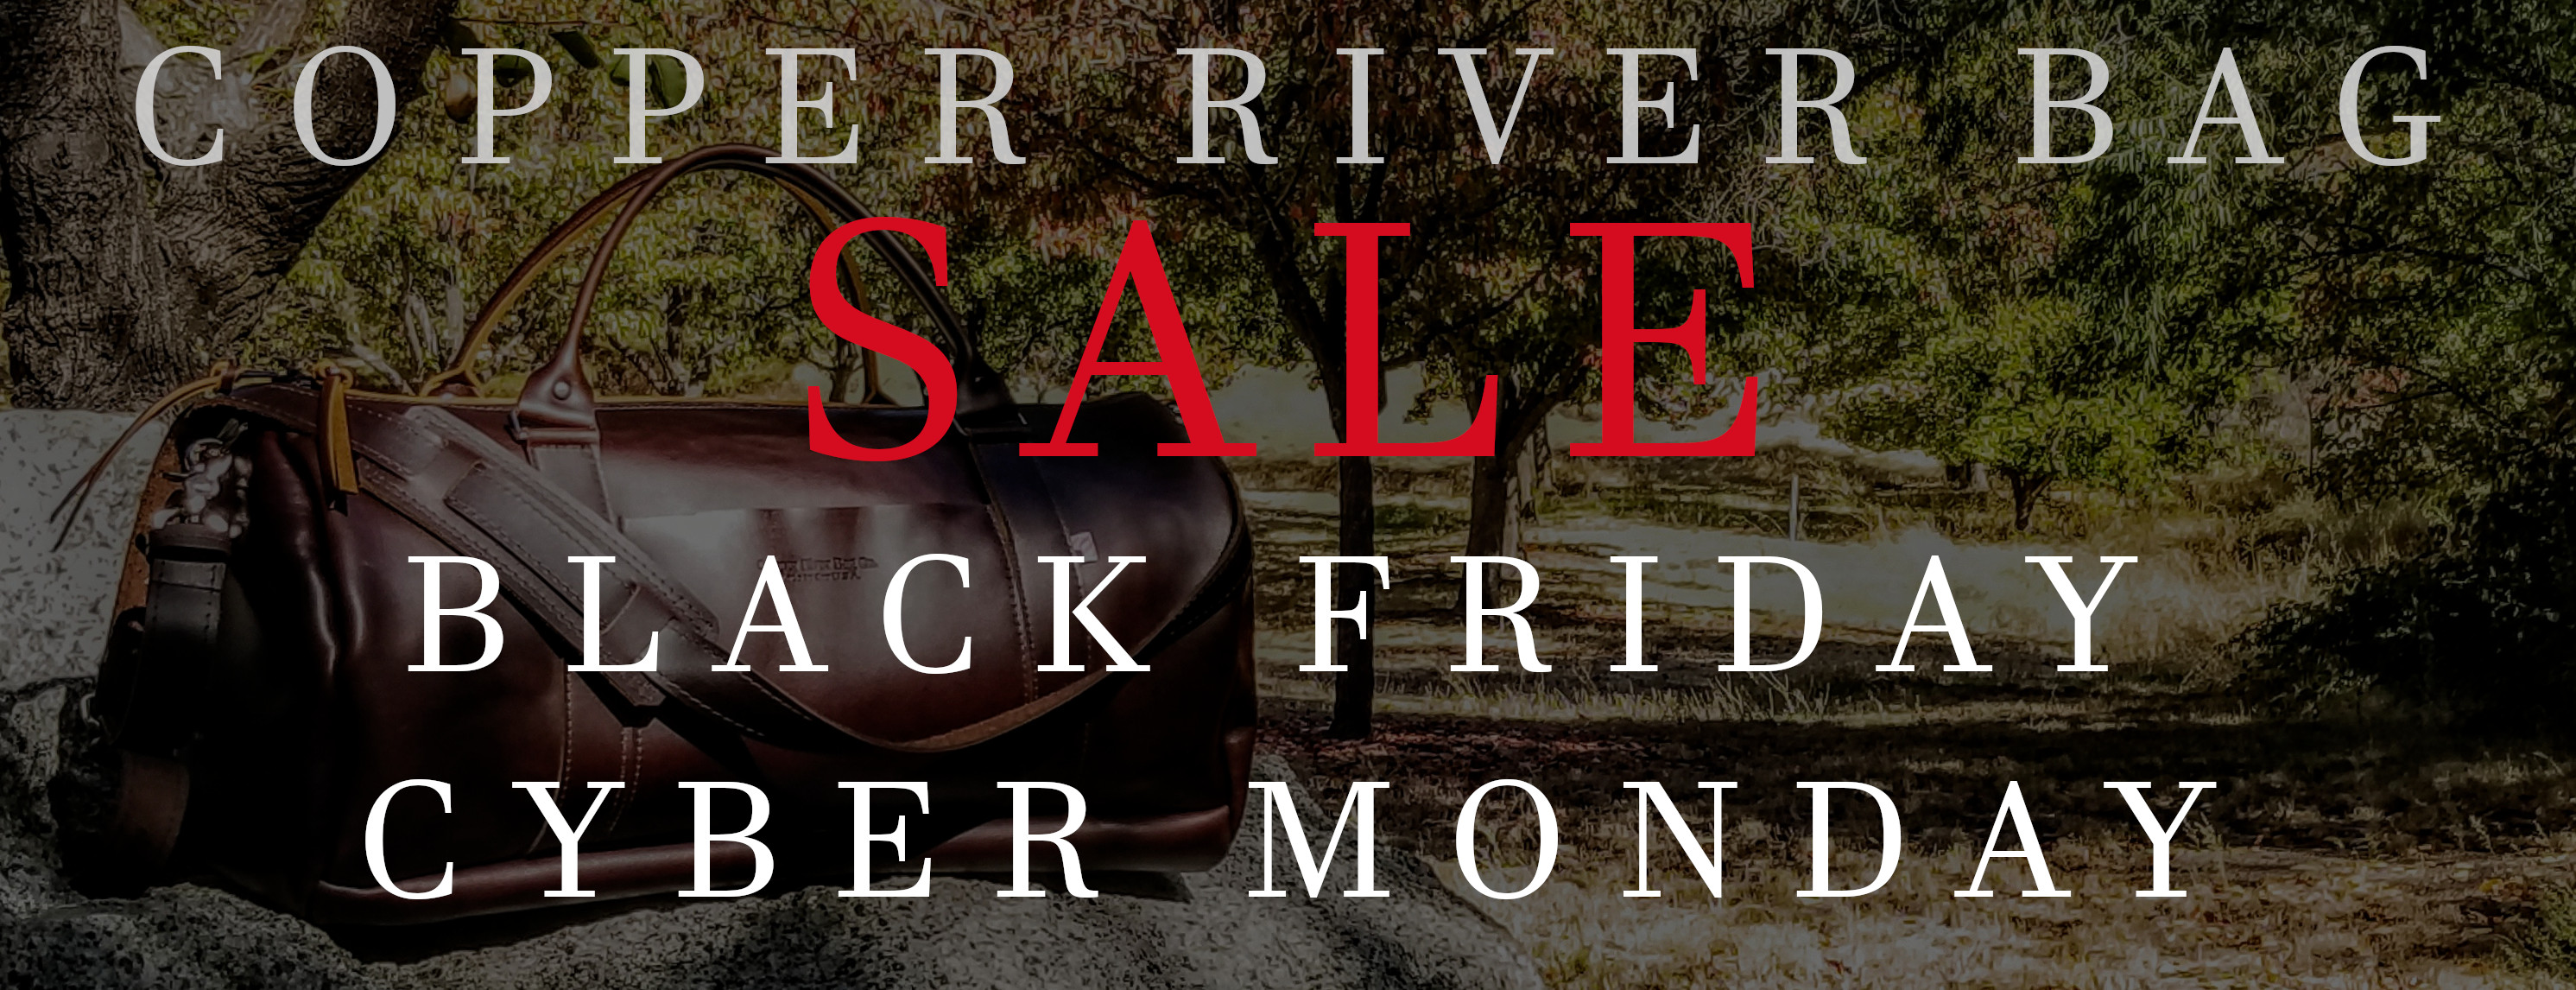 black-friday-cyber-monday-copper-river-bag-sale.jpg